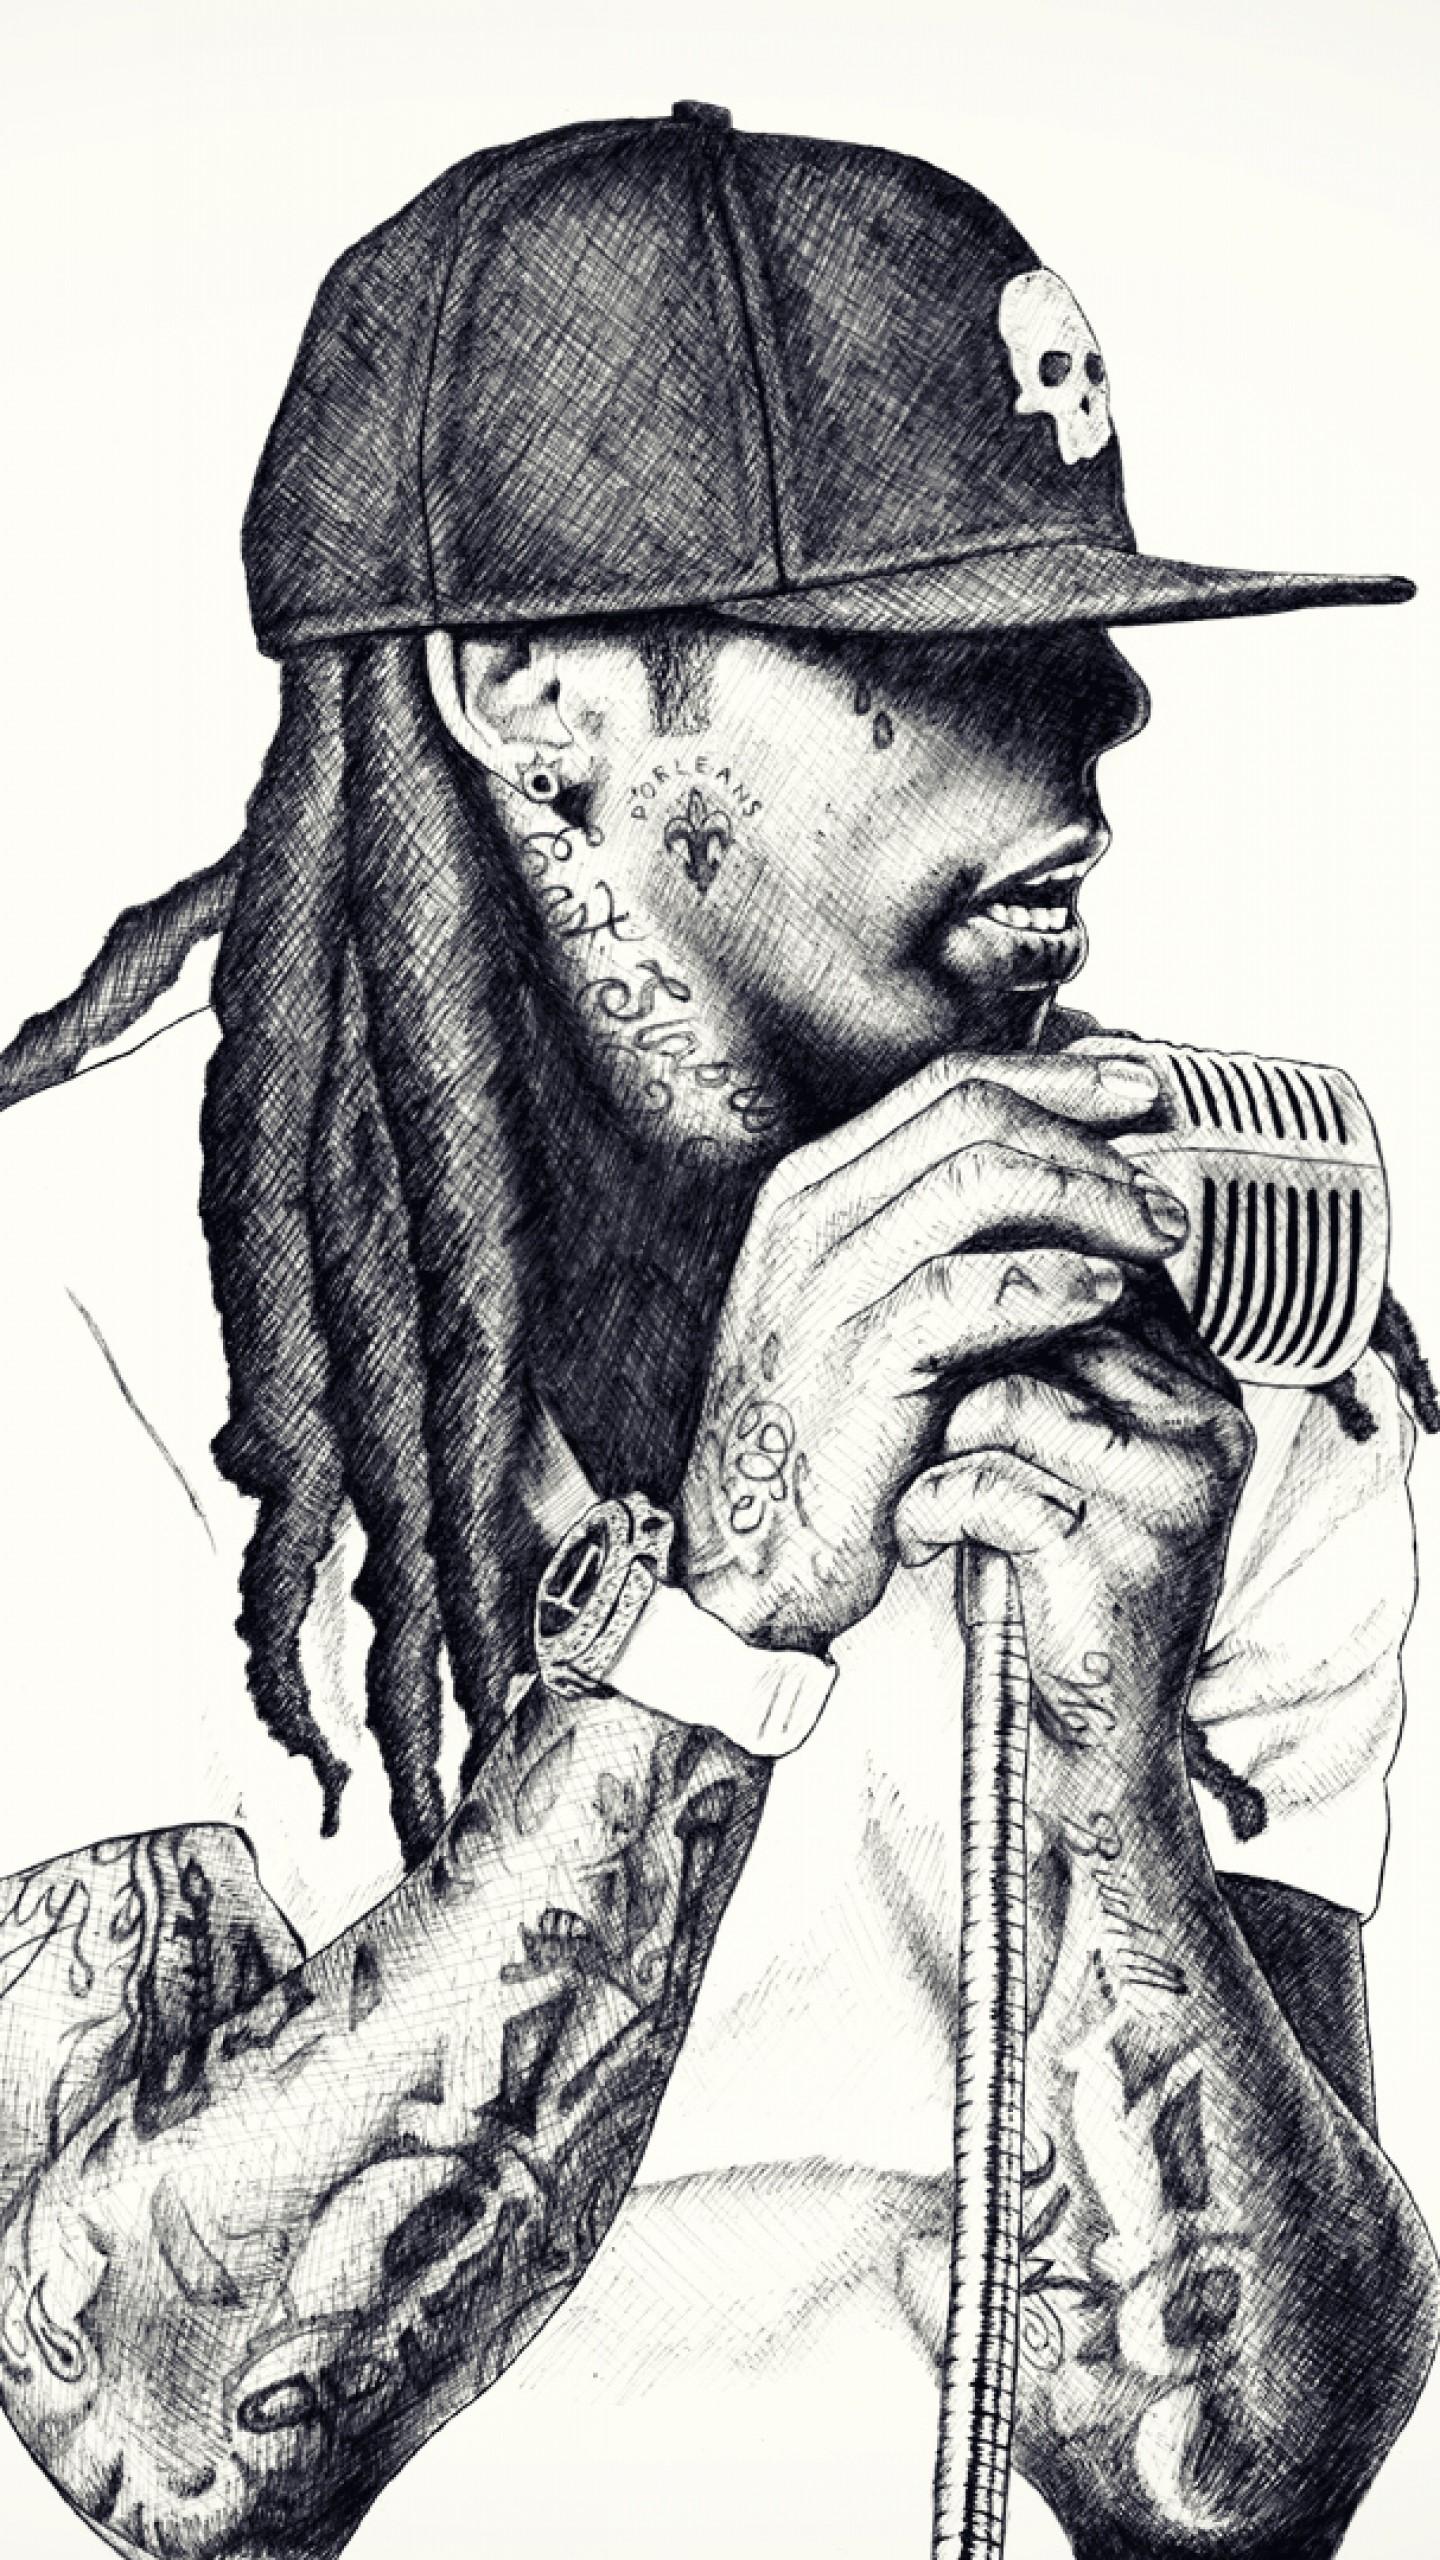 Preview wallpaper lil wayne, rap, singer, microphone, baseball cap,  dreadlocks 1440×2560